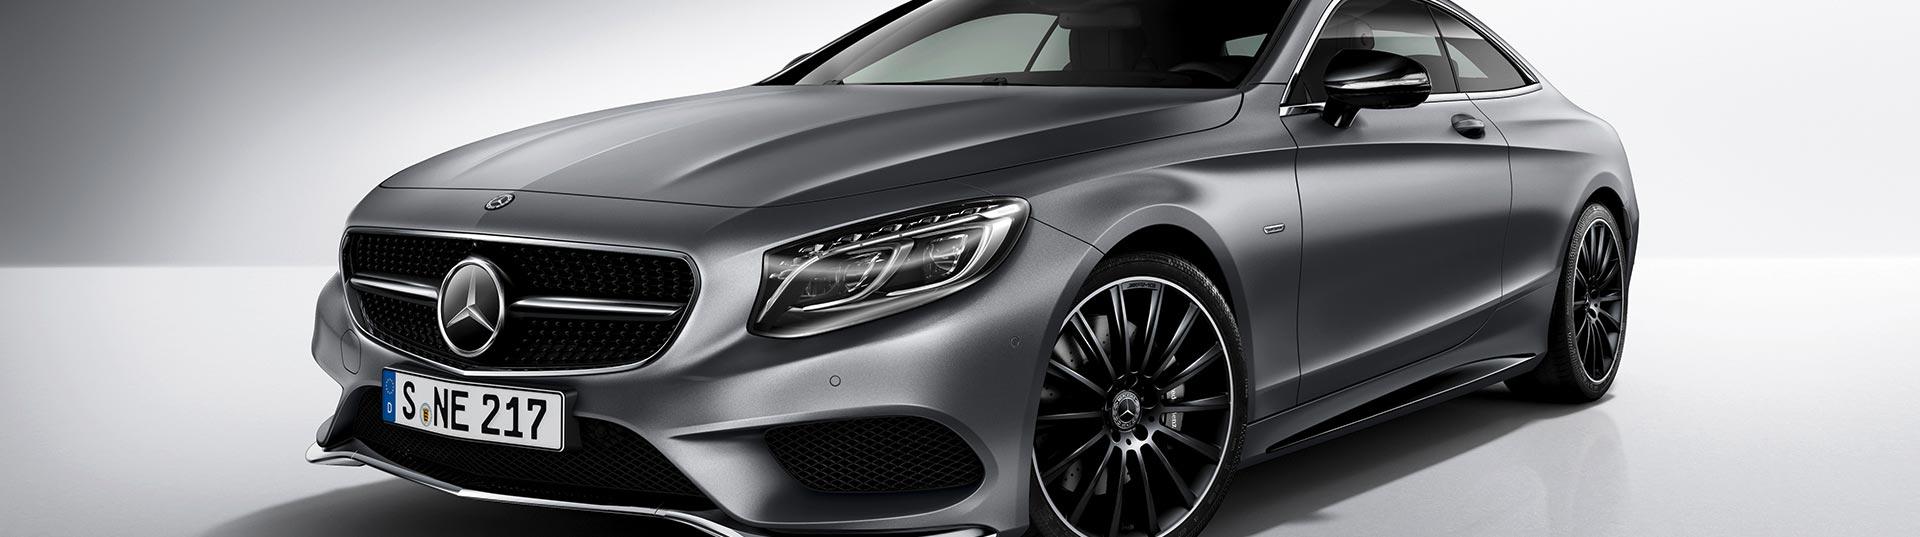 Mercedes Classe S Night Edition